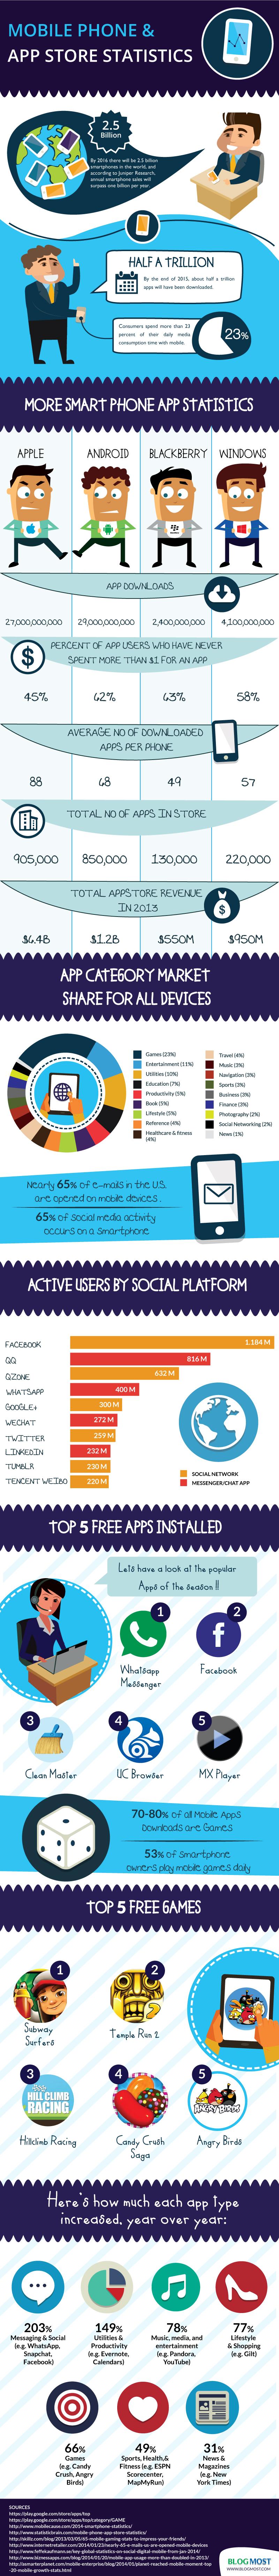 Mobile-Phone-App-Store-Statistics-Infographic-800px